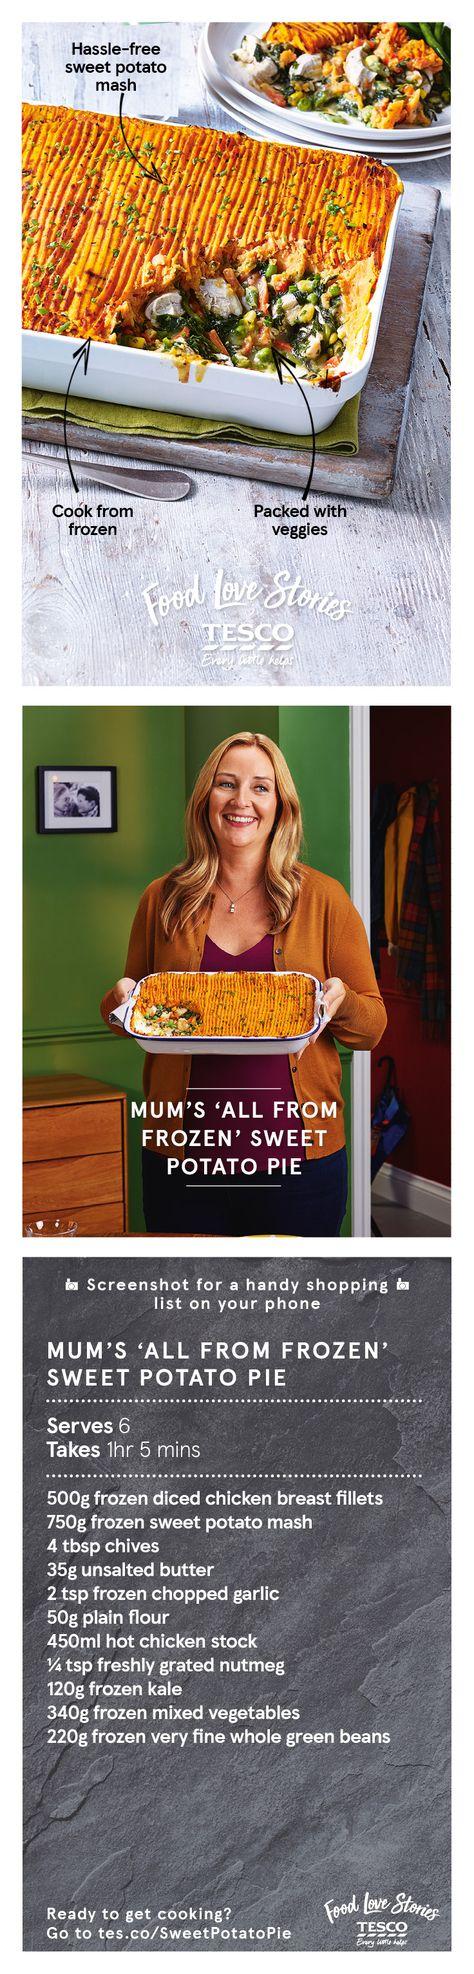 Mums All From Frozen Sweet Potato Pie